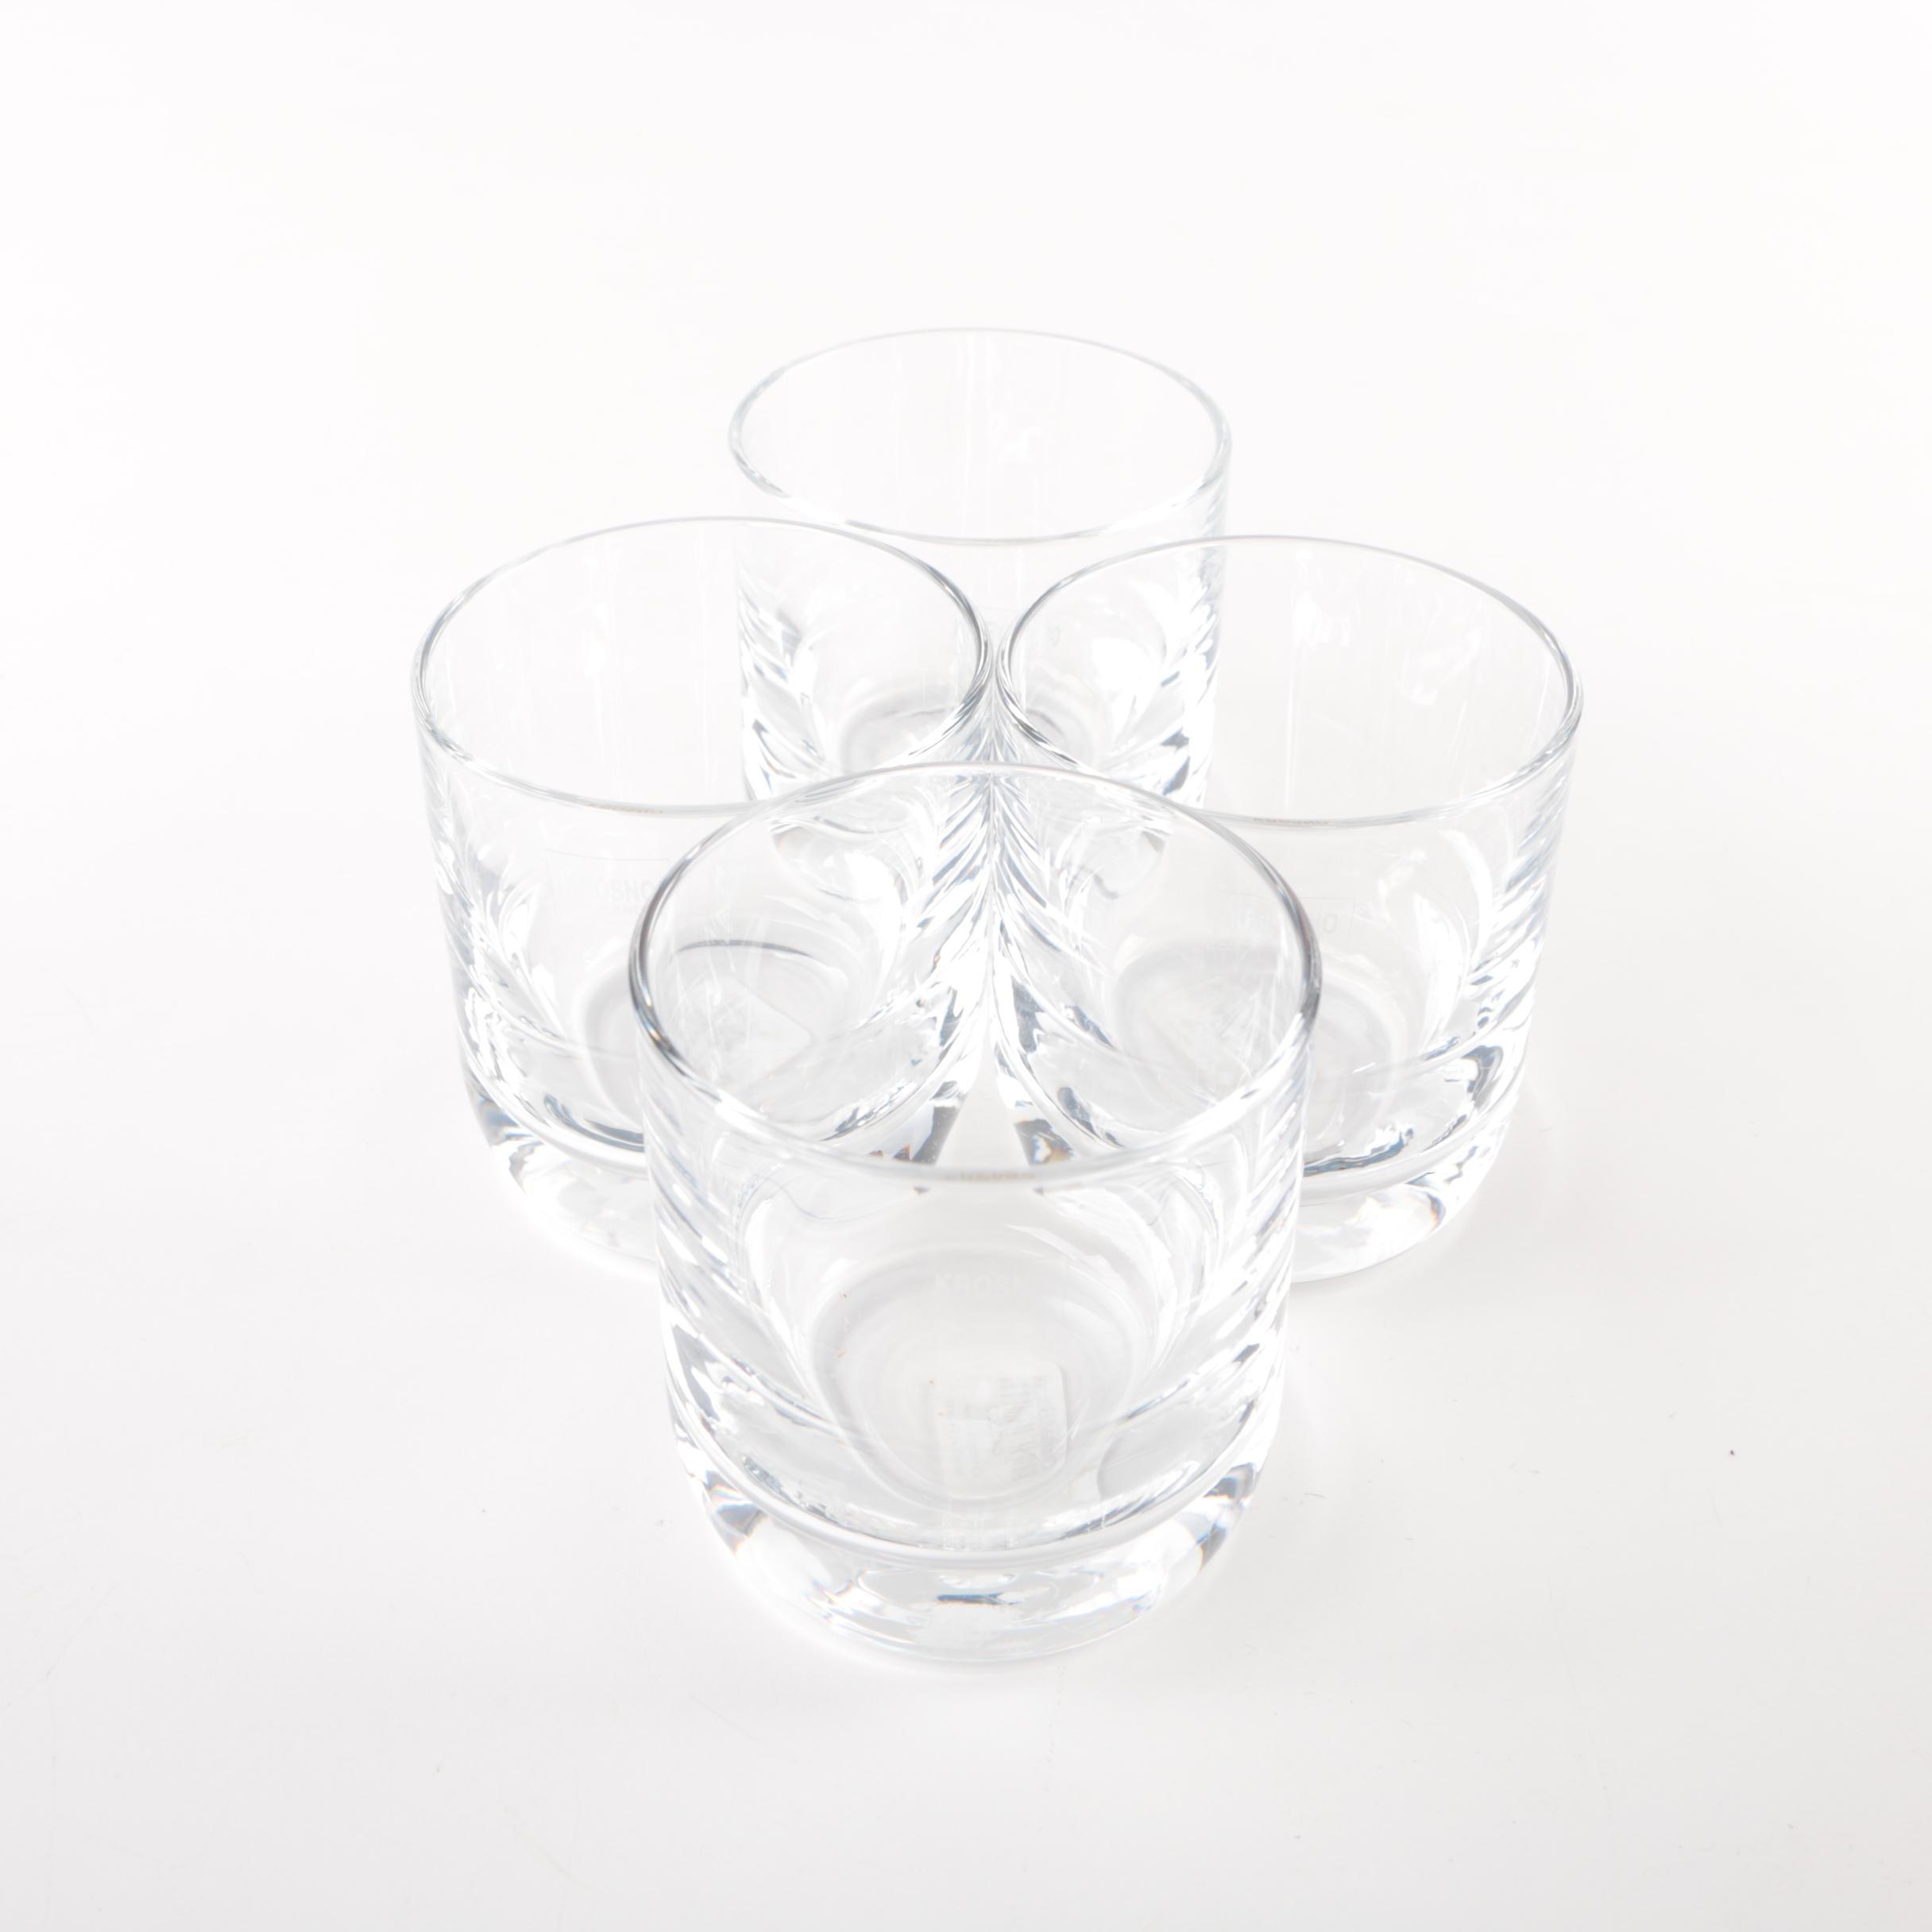 Krosno Rocks Glasses